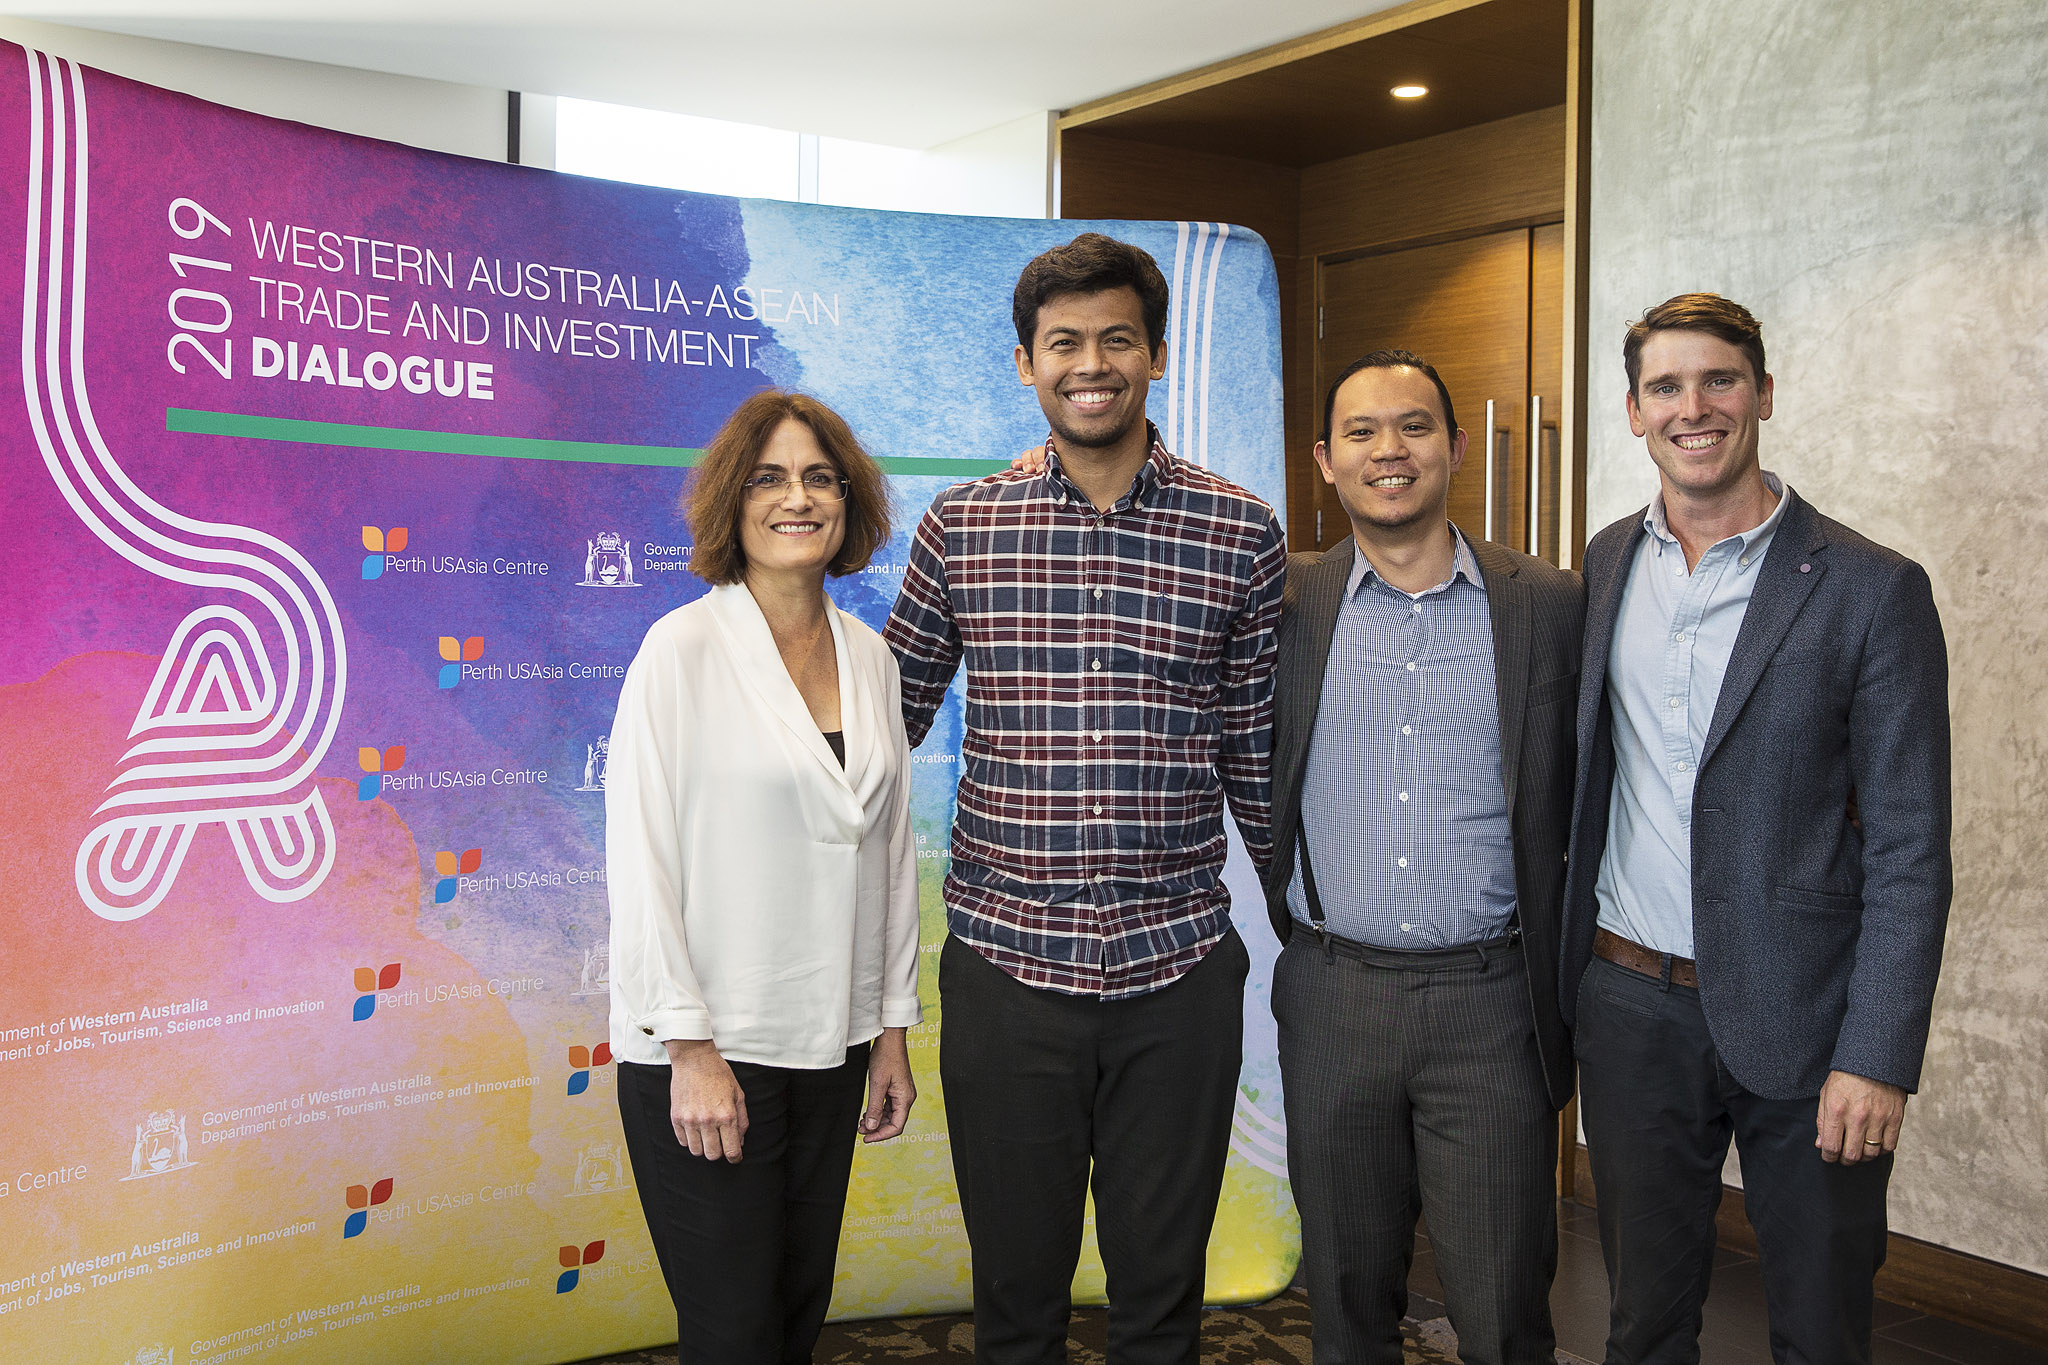 Asian dating perth australia